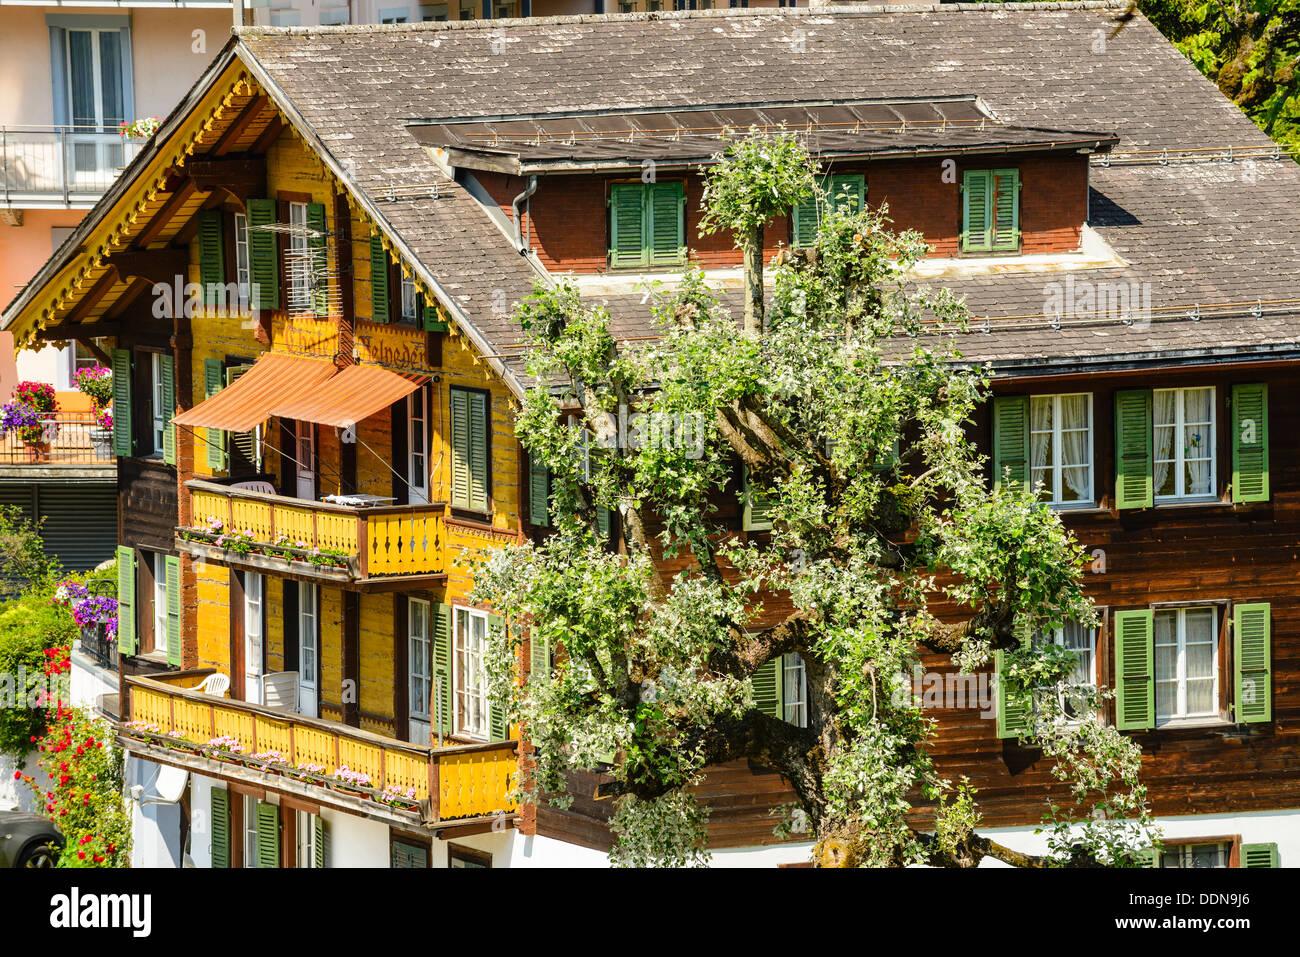 Chalet Belvedere Grindelwald Switzerland - Stock Image